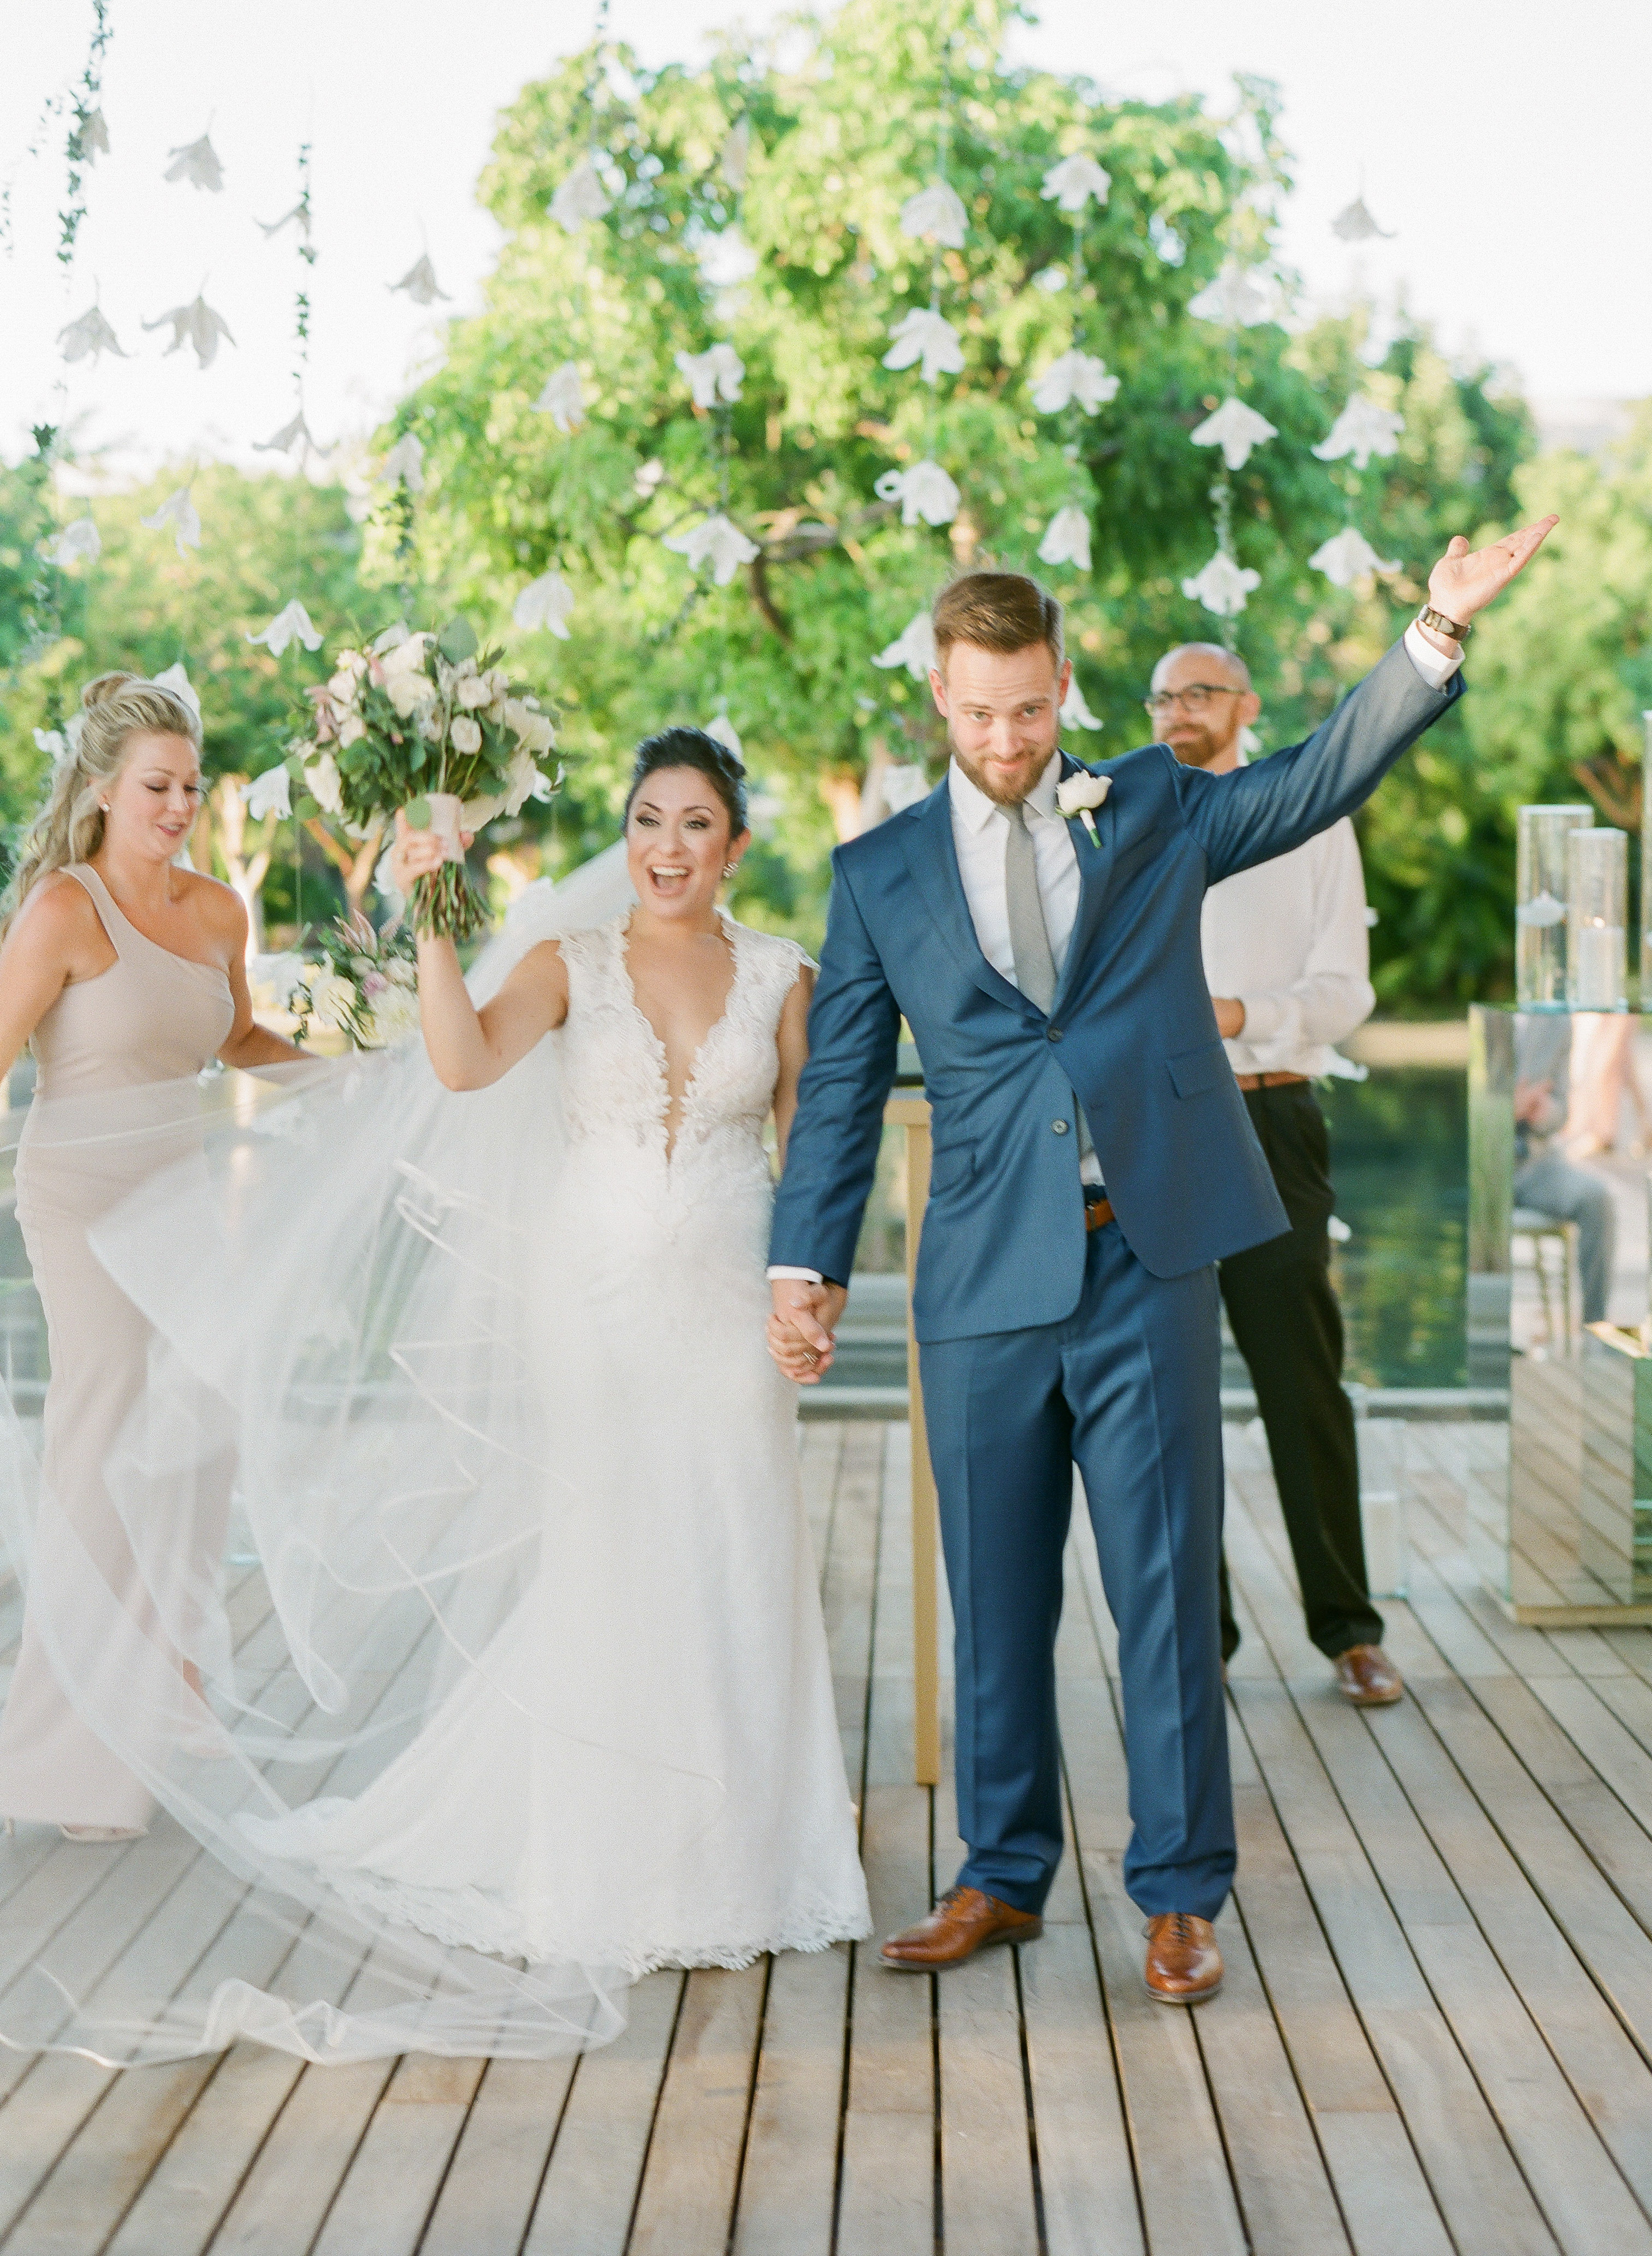 vicky james mexico wedding bride groom ceremony